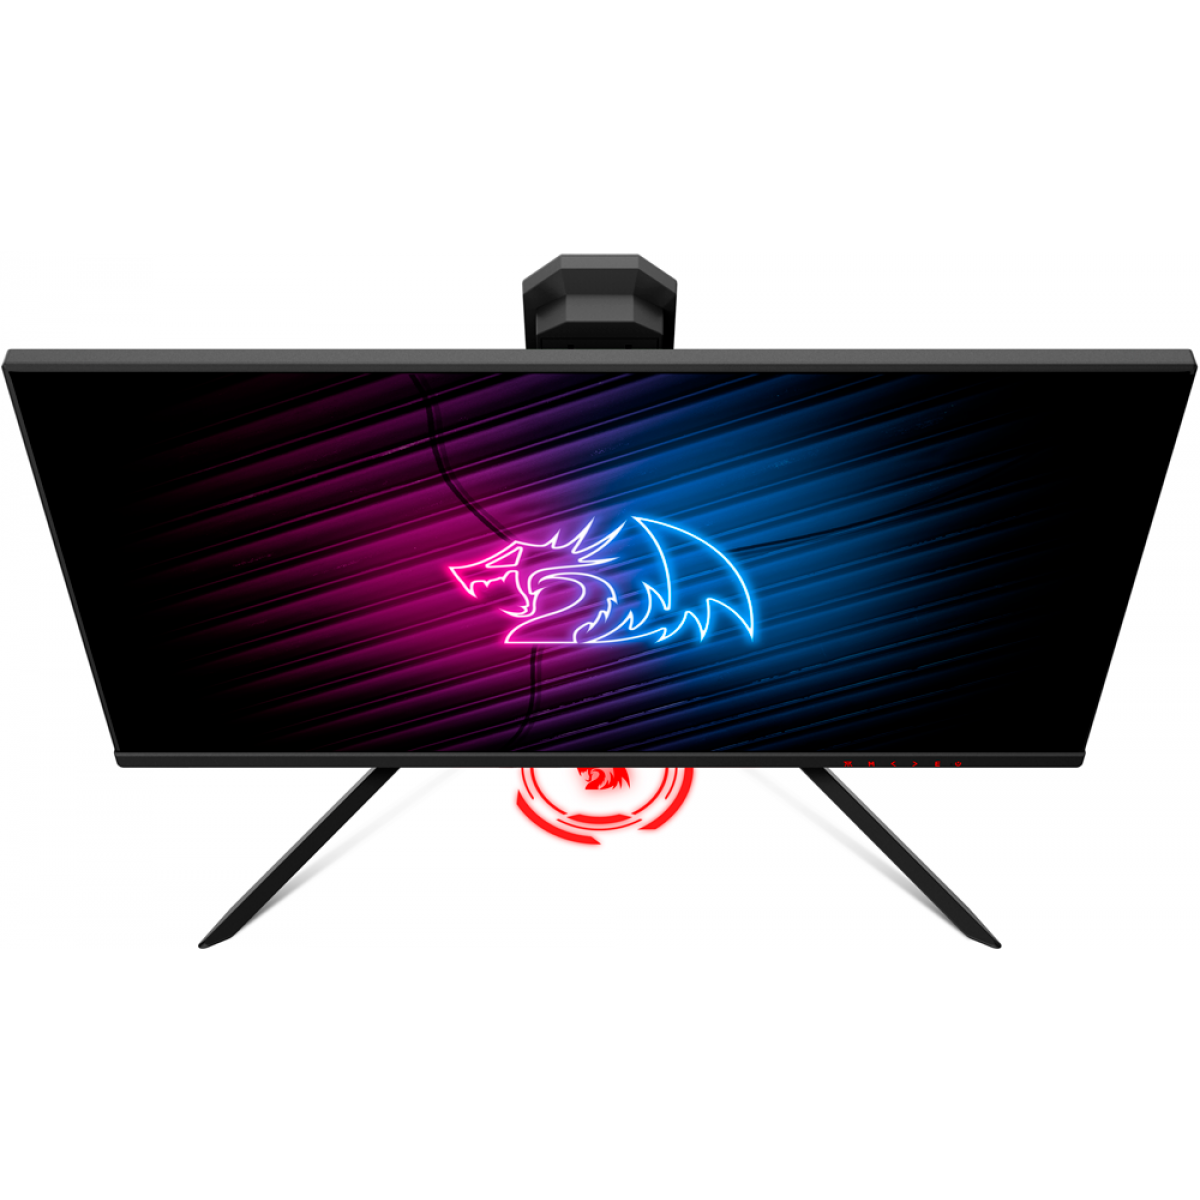 Monitor Gamer Redragon Blackmagic RGB, 27 Pol, Full HD, 144Hz, 1ms, HDMI, Display Port